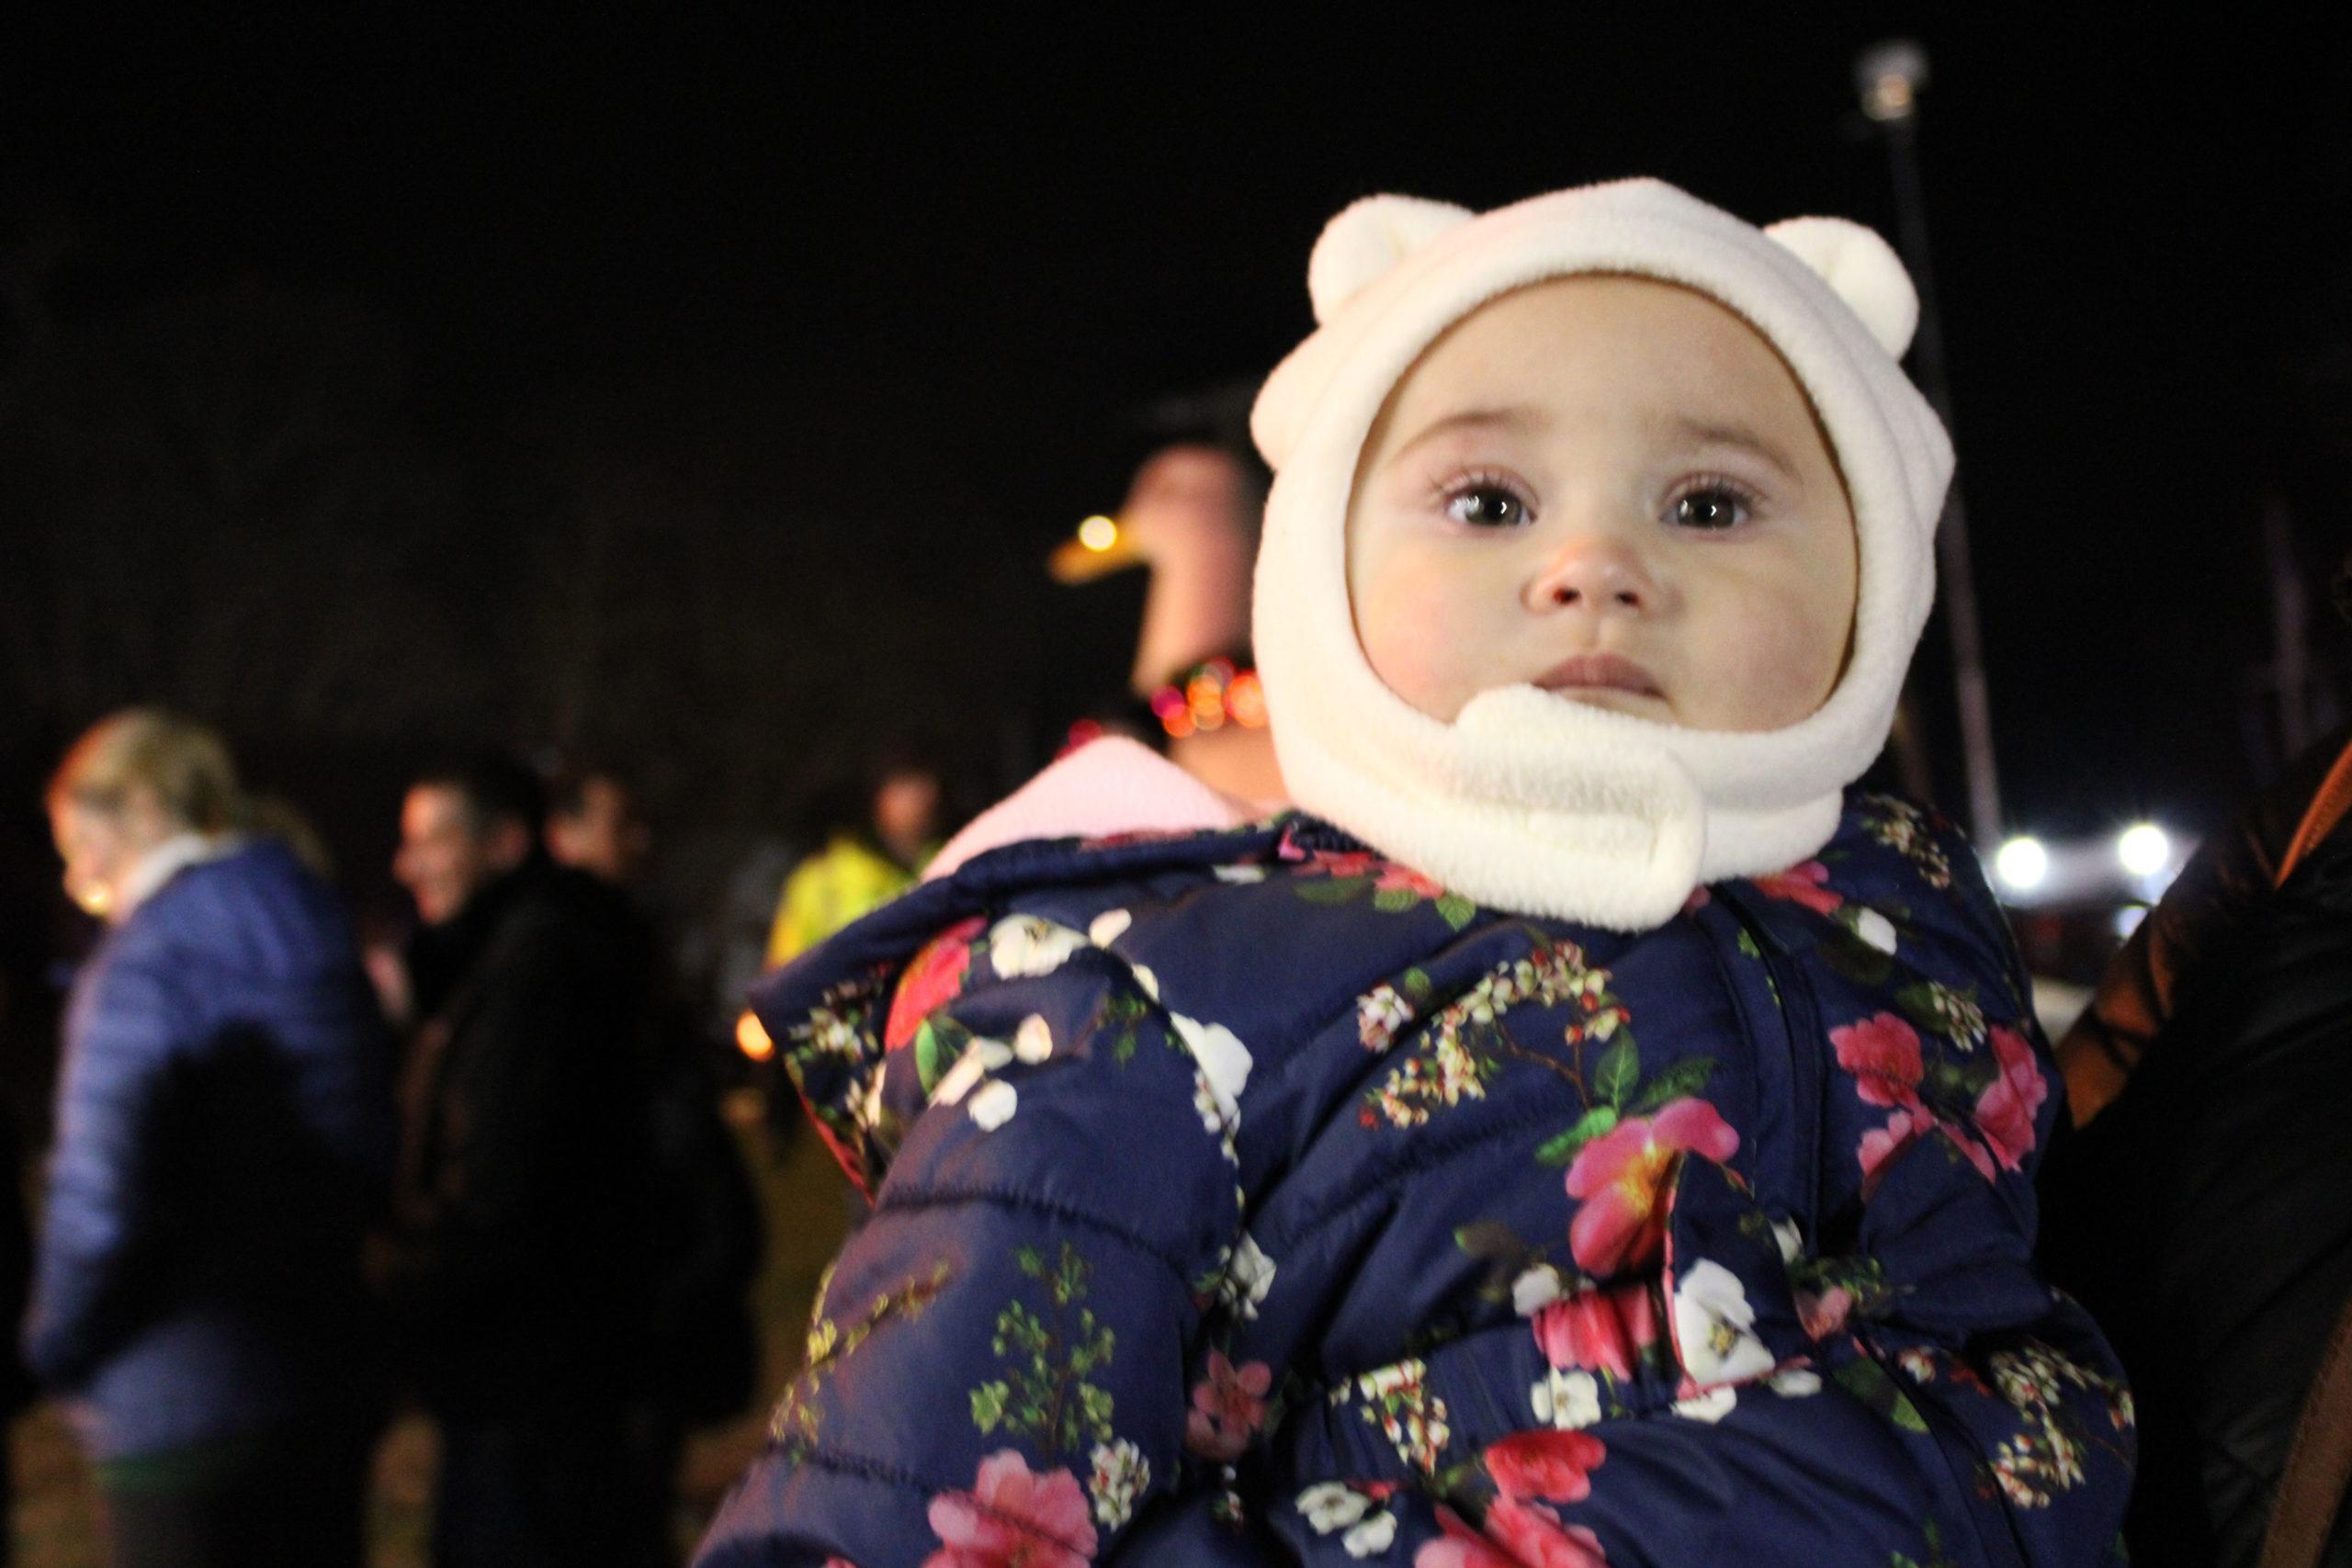 Eliana Valderrama watching Santa on stage.